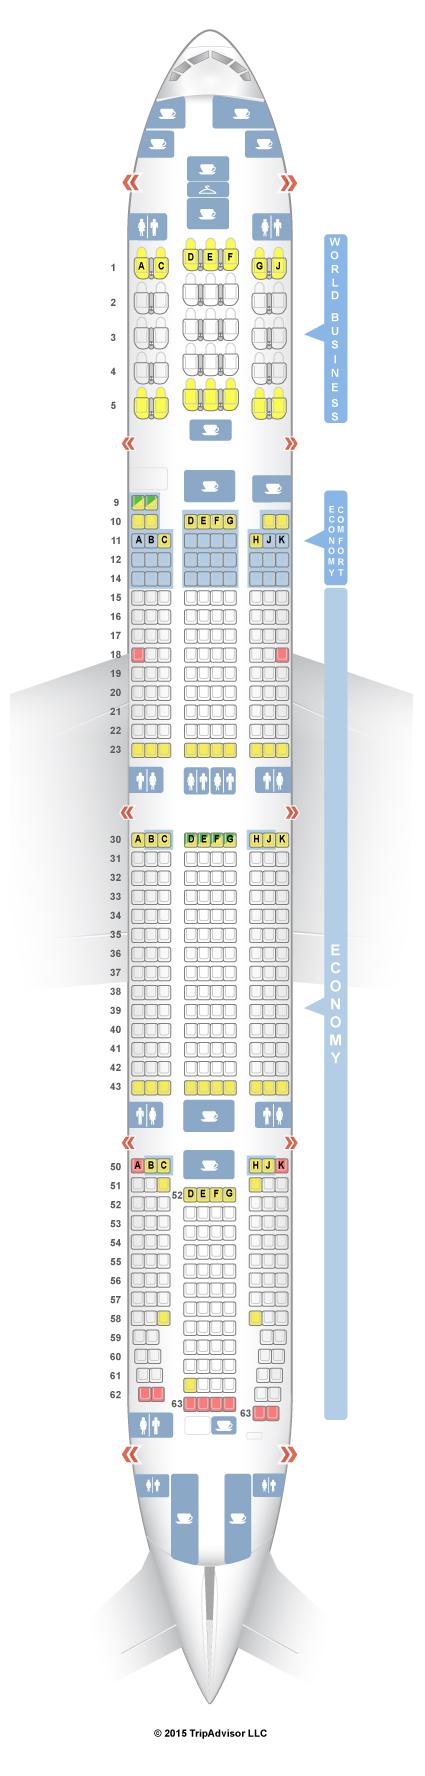 Seatguru Seat Map Klm Boeing 777 300er Brokeasshome Com